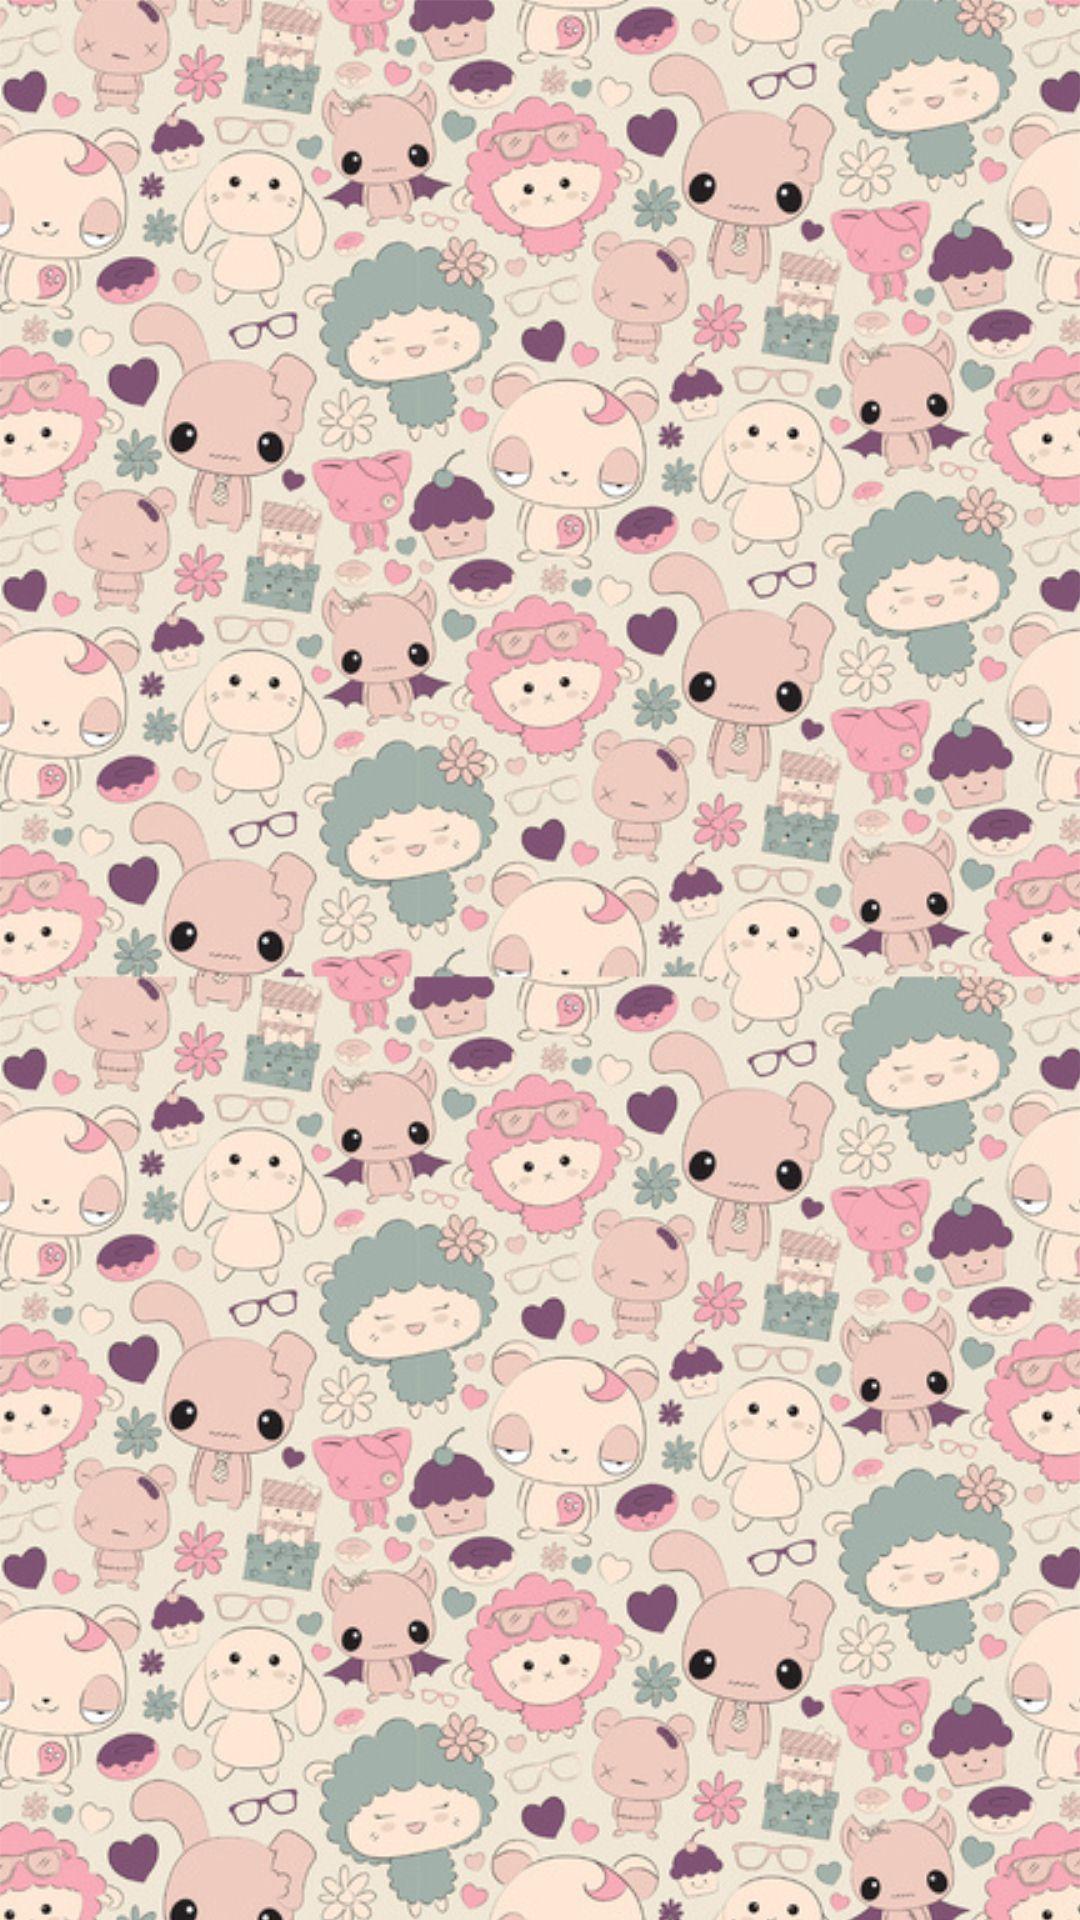 Gravity Falls Wallpaper Hd Iphone Kawaii Iphone Wallpapers Pixelstalk Net